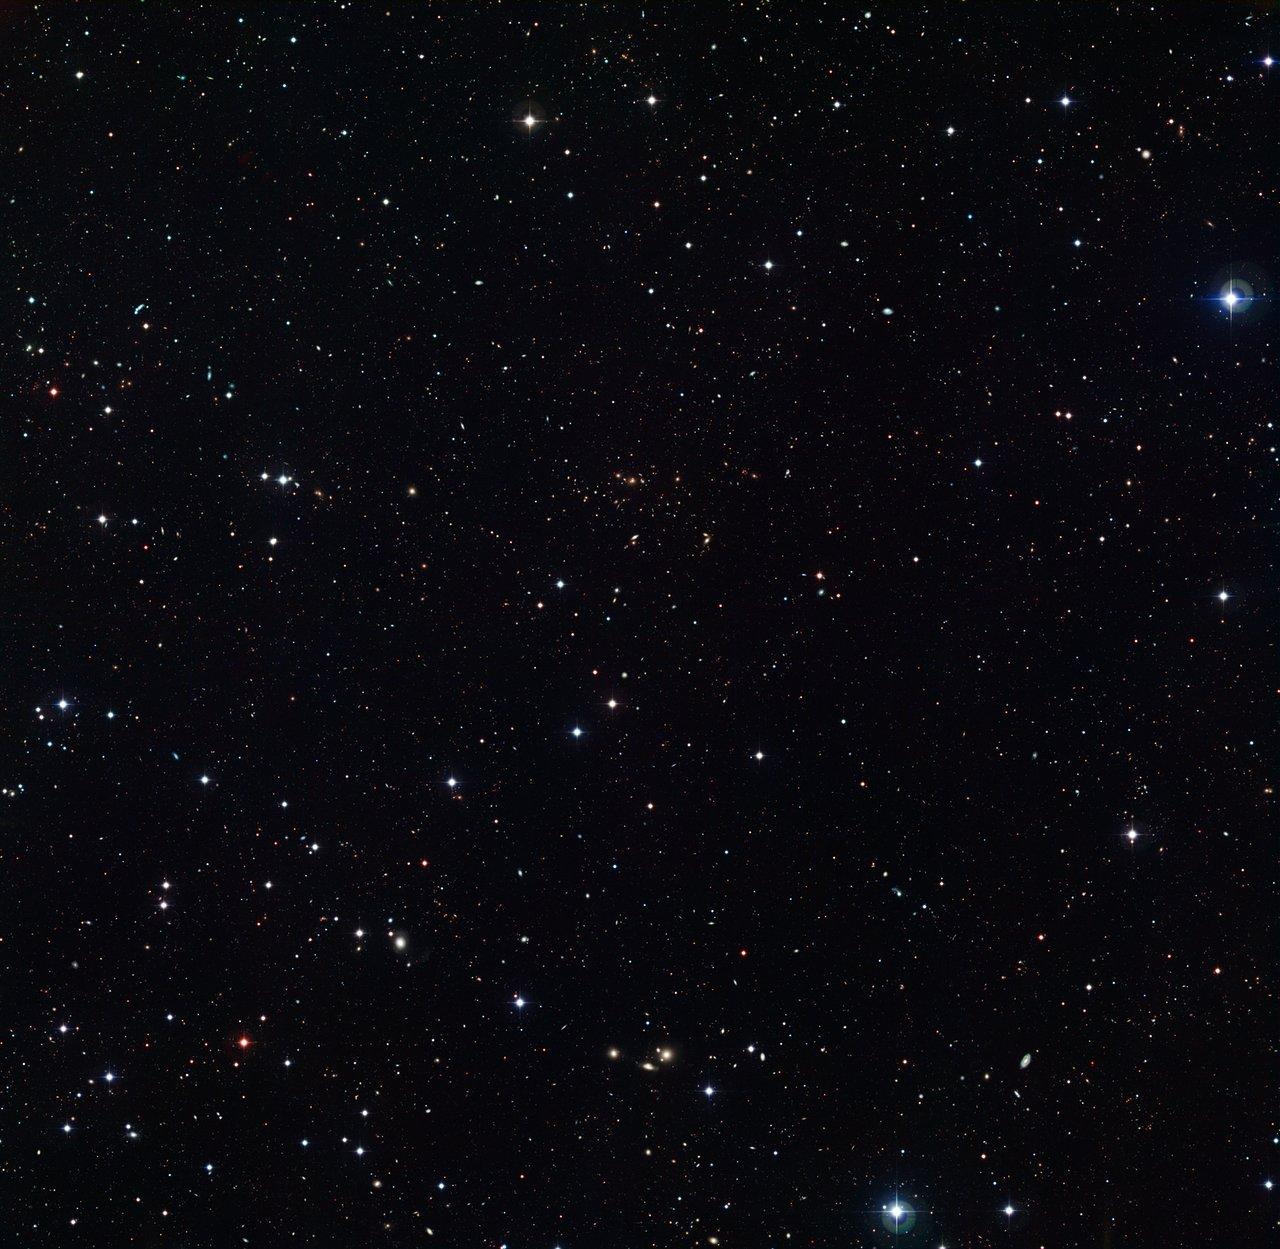 Svelare stelle e galassie lontane